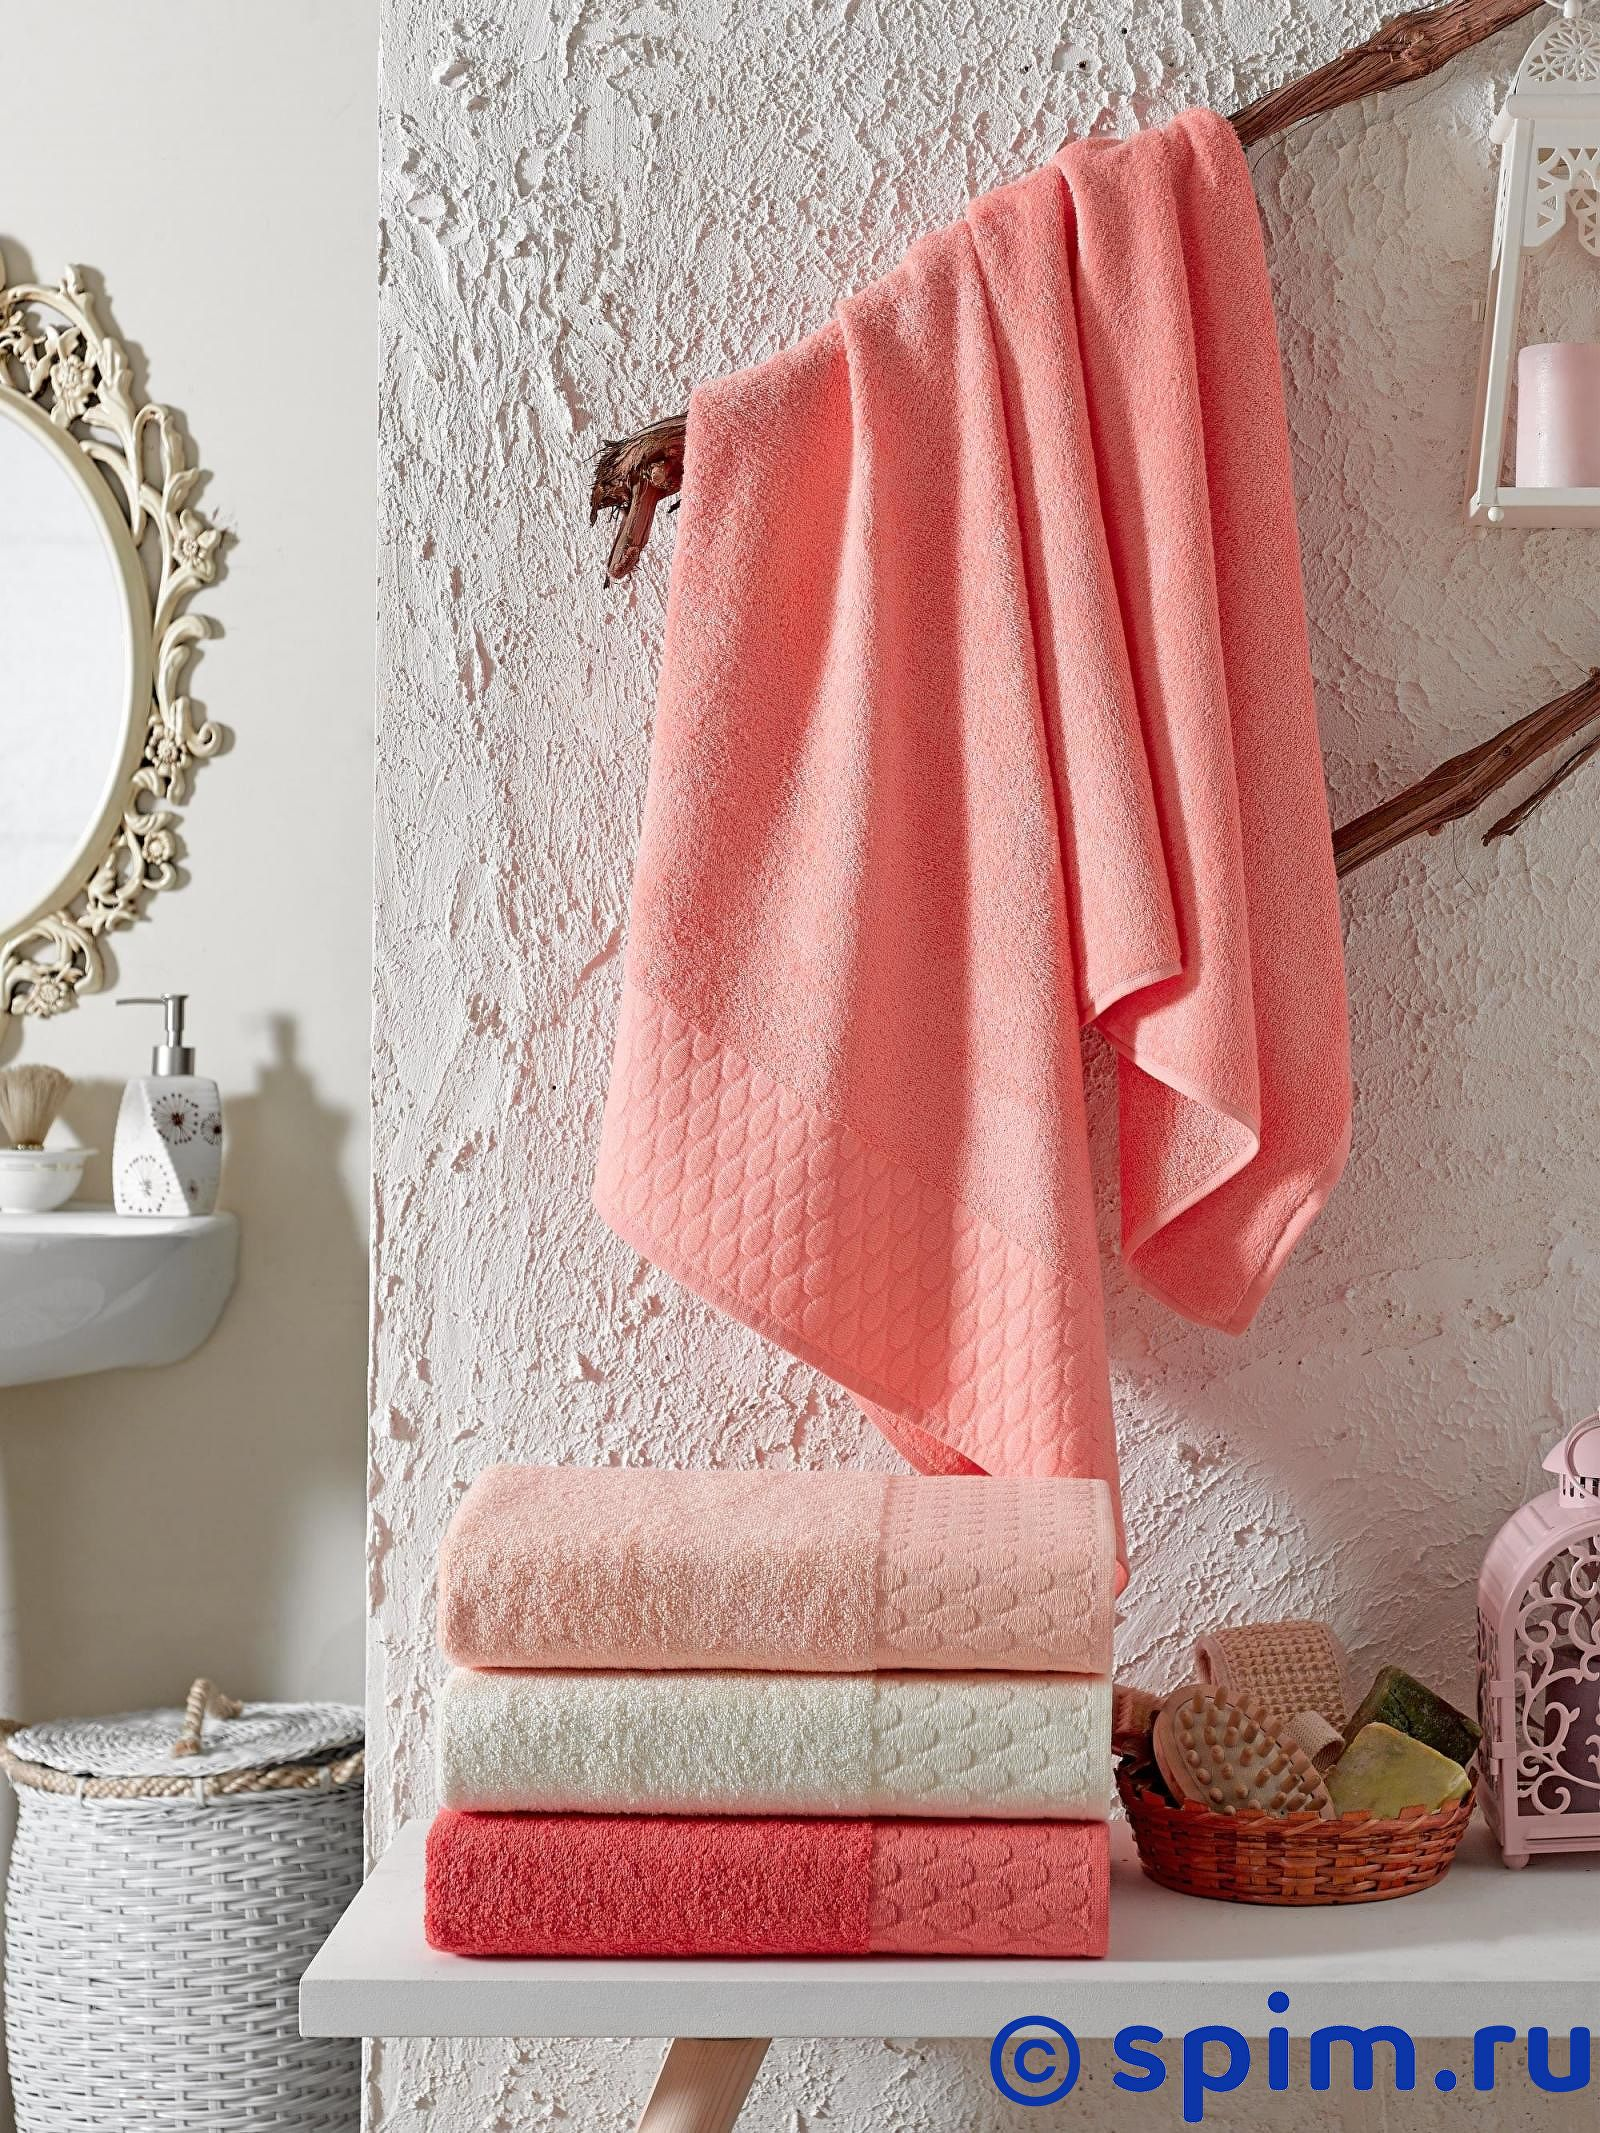 Набор из 4-х полотенец Do&co Cristie 70х140 см полотенца do n co полотенце lady цвет мятный набор